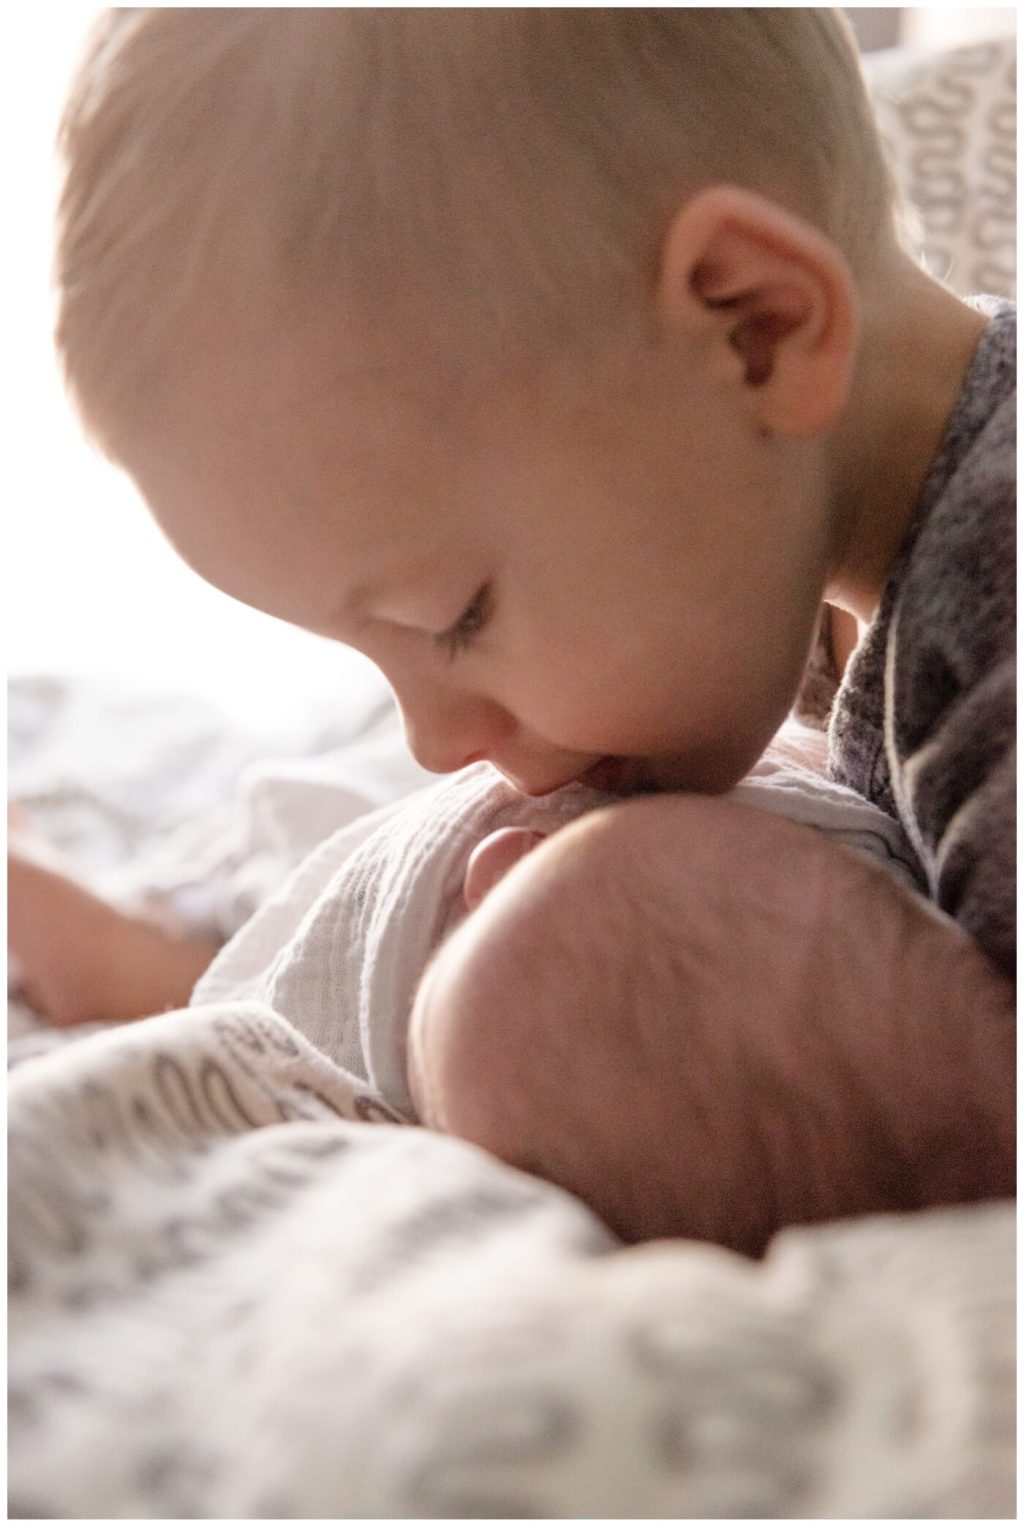 Regina Family Photographer - Jensen Newborn - Jensen-Kayden - In home Family Session - Kisses from big brother